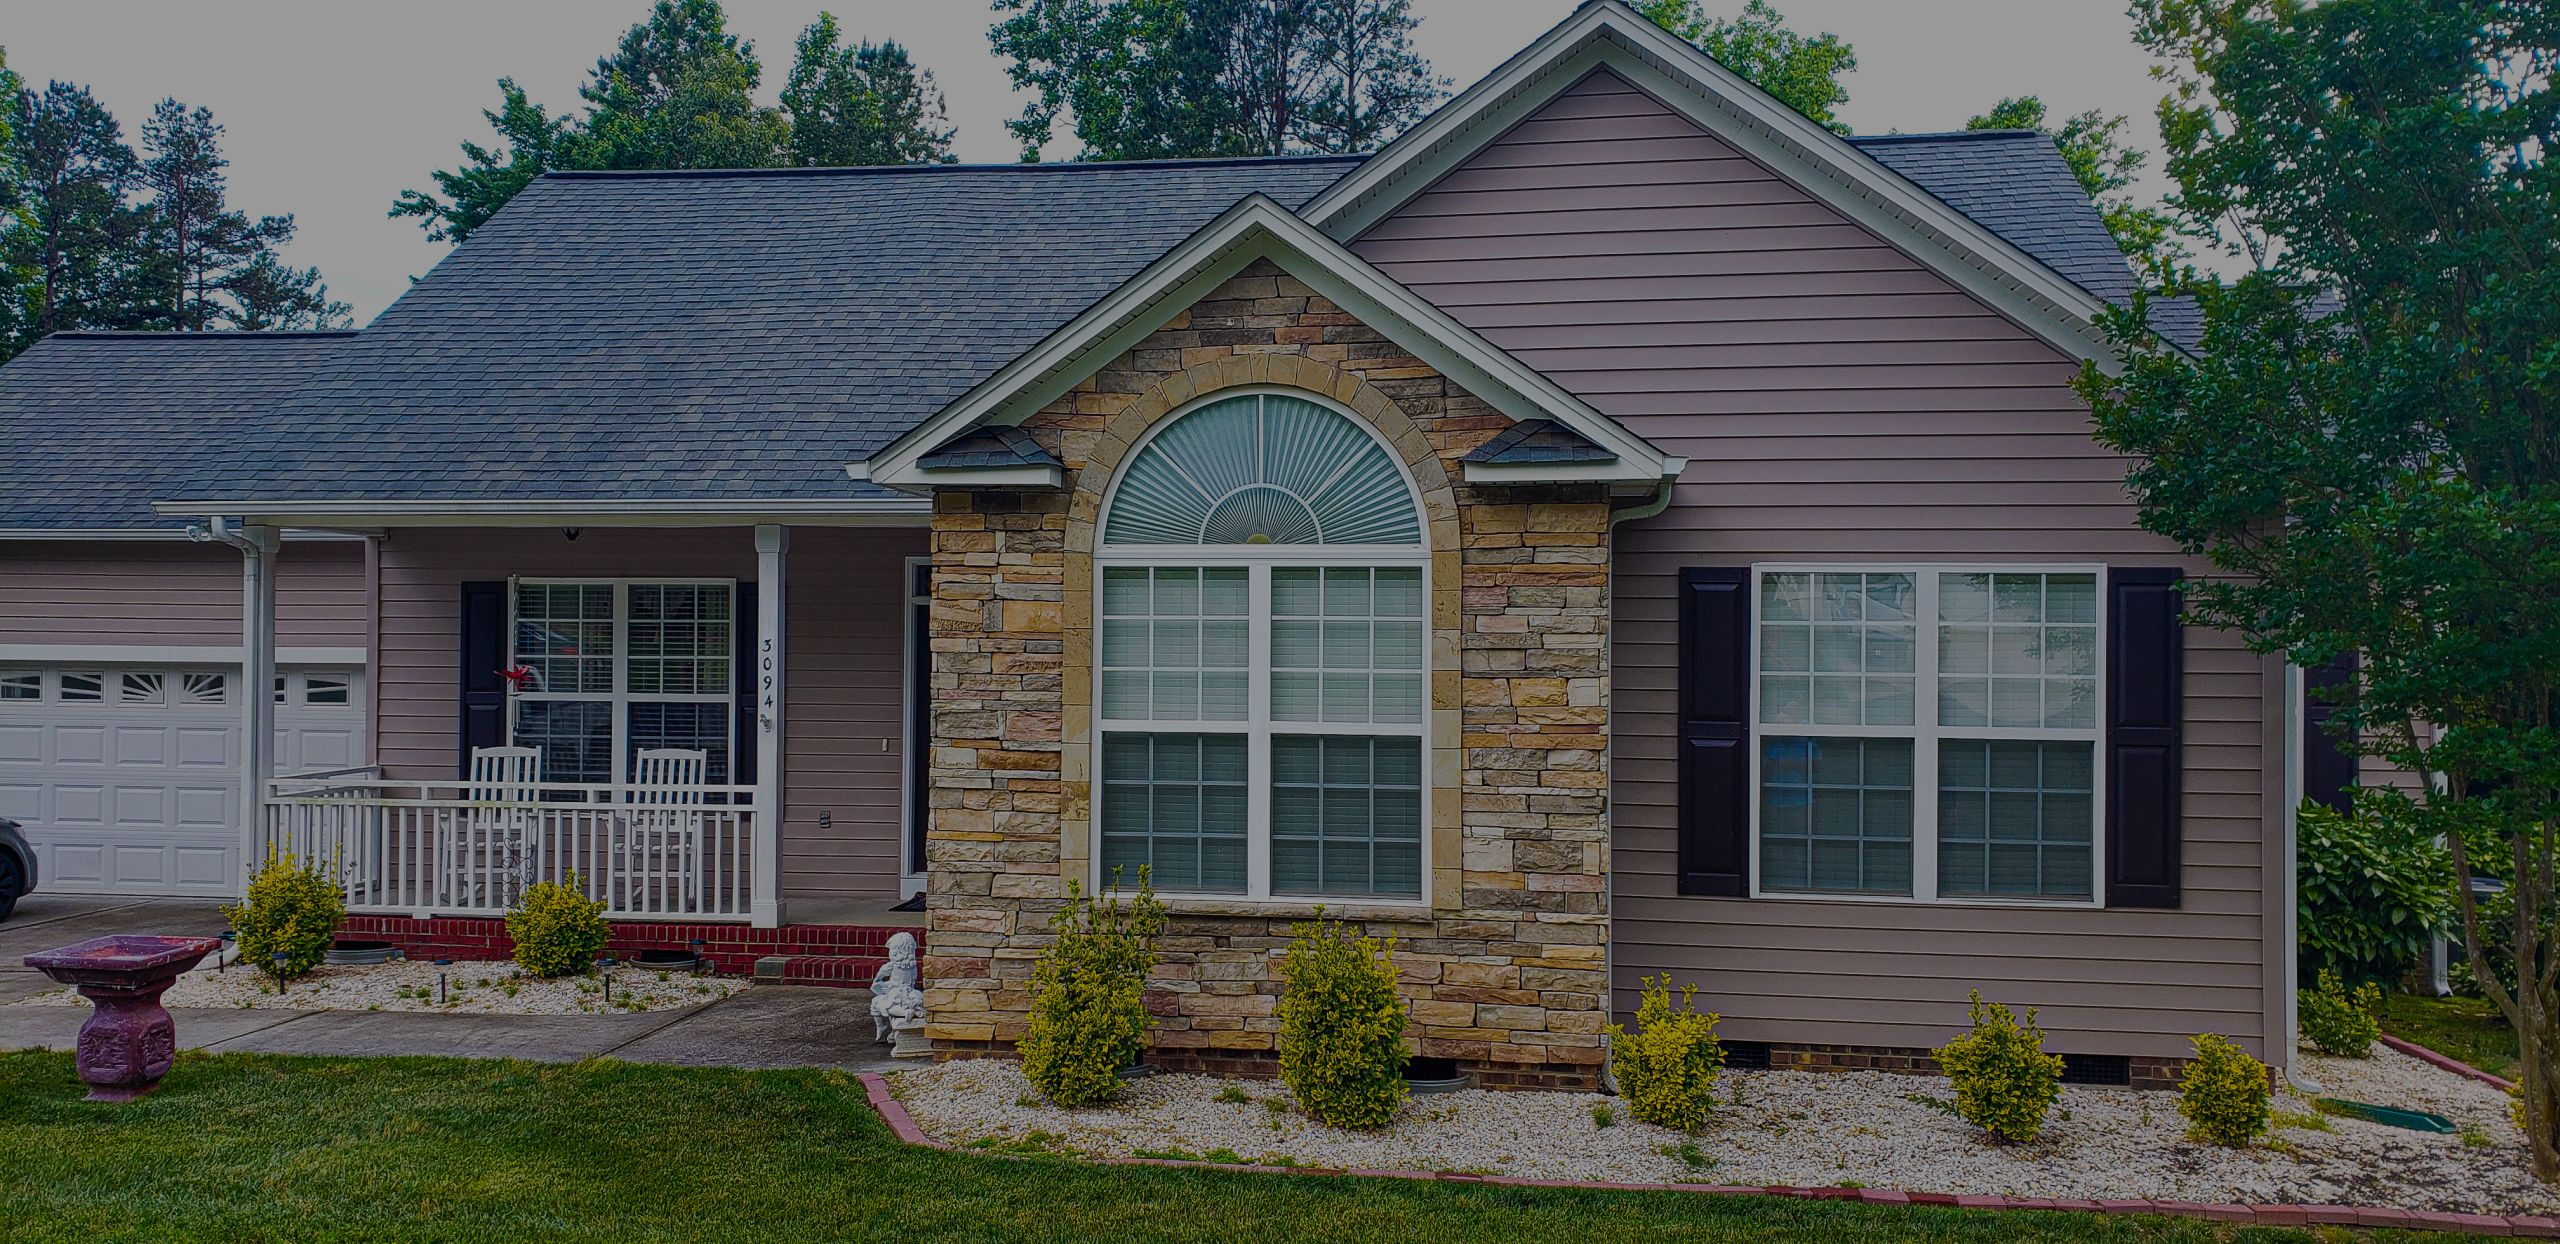 Gastonia NC, Selling Real Estate Tips